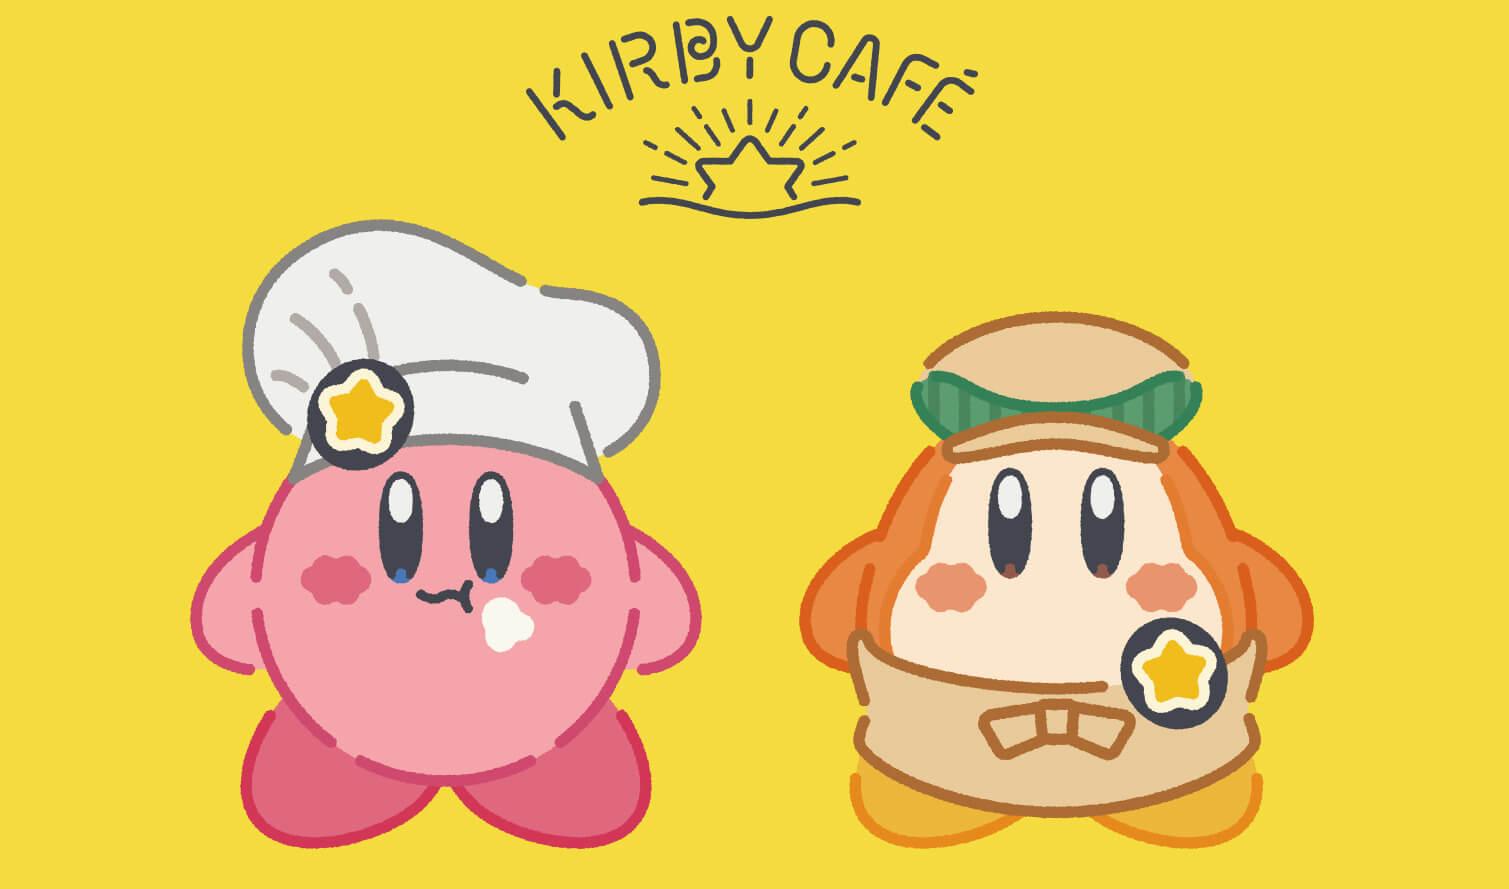 Kirby-Cafe-6